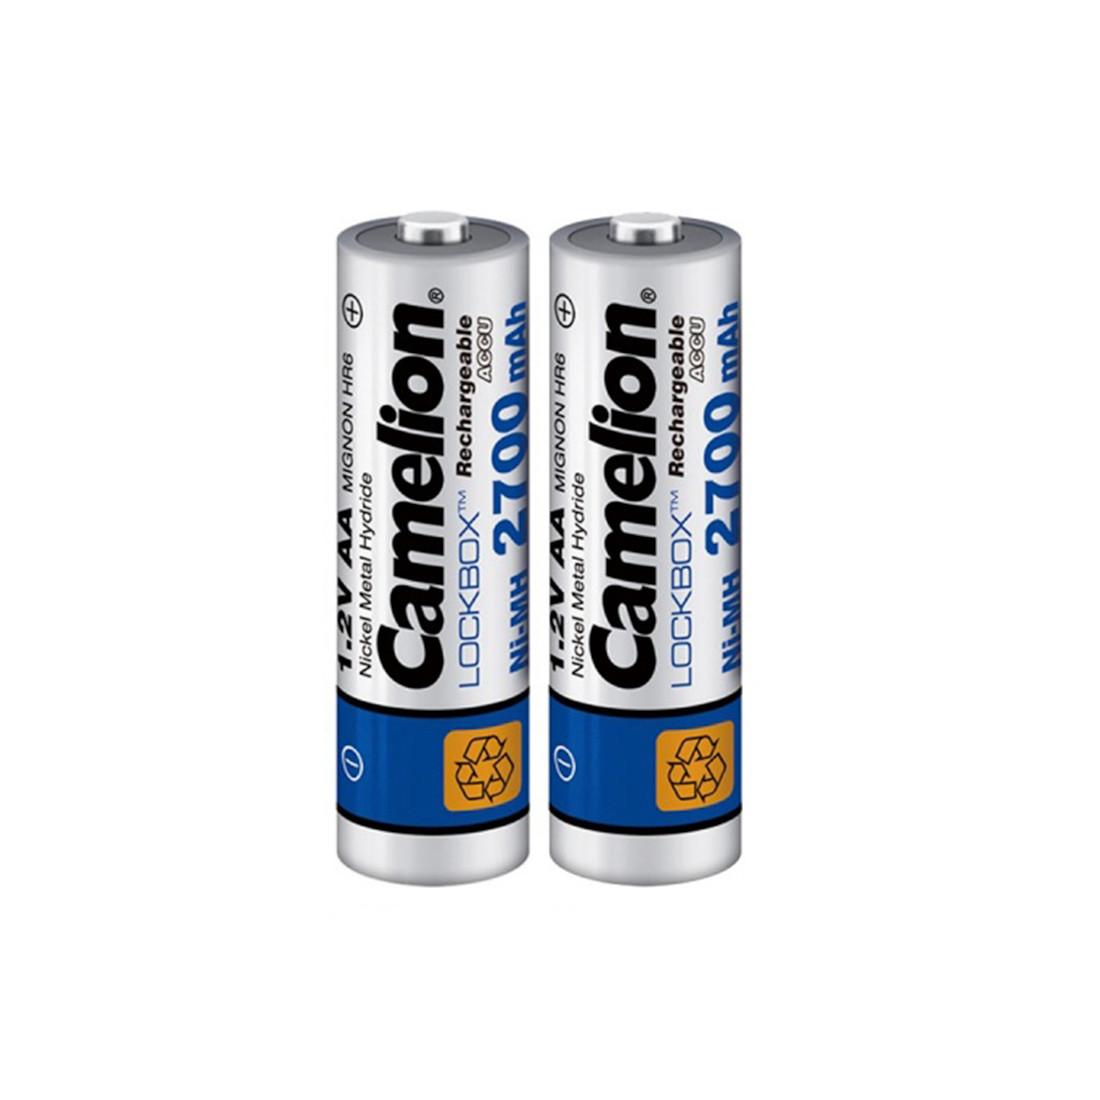 CAMELION NH-AA2700LBP2 Аккумуляторная батарея Lockbox Rechargeable, AA, 1.2V, 2700 mAh, 2 шт. в блистере